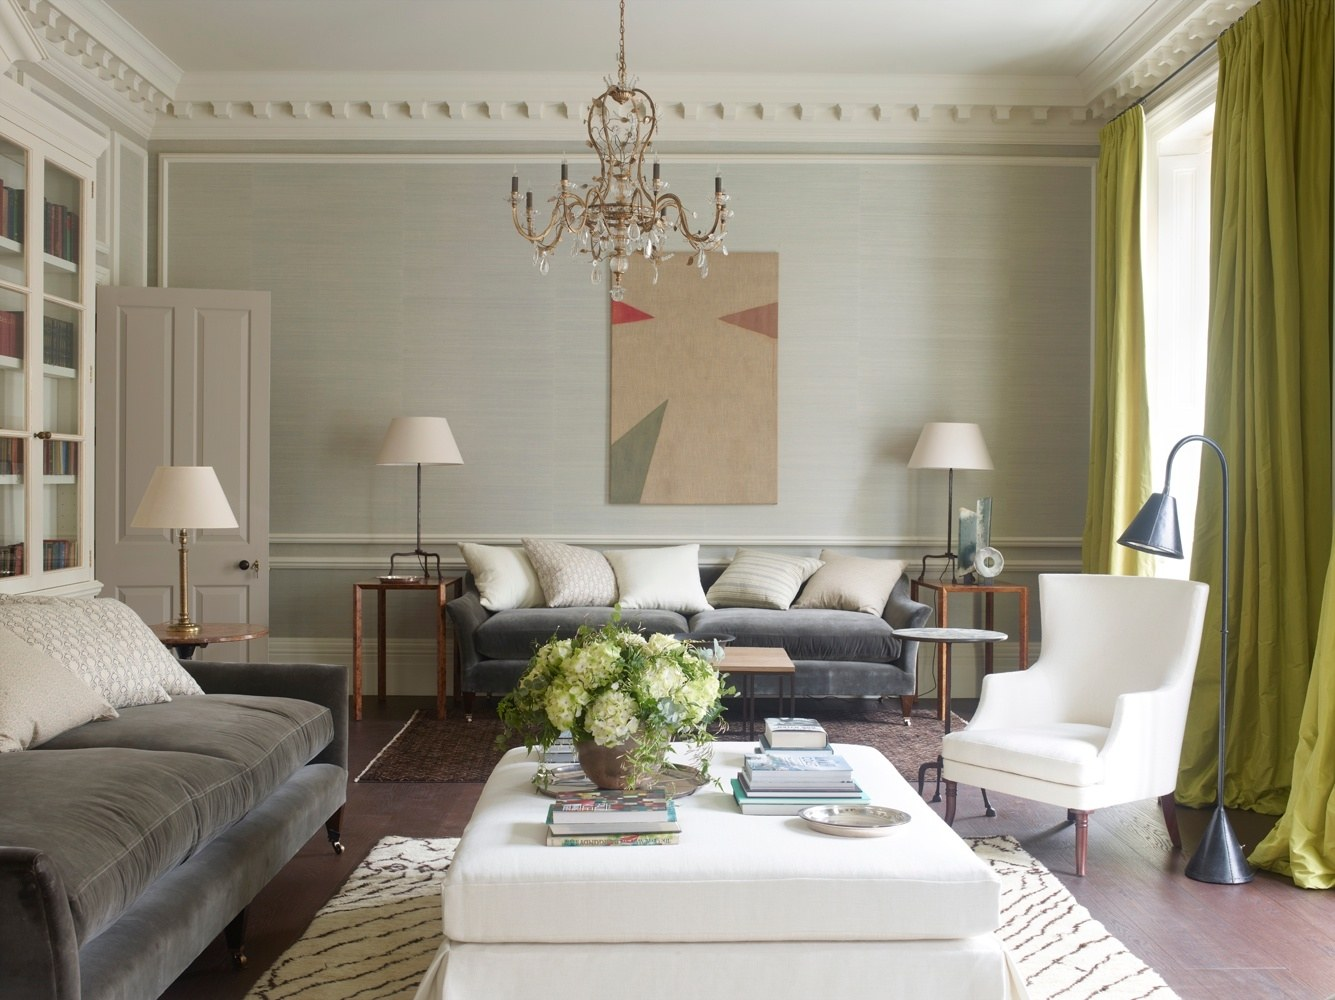 The Leading British Interior Designers By AD 100 List – II Part Rose Uniacke Interiors